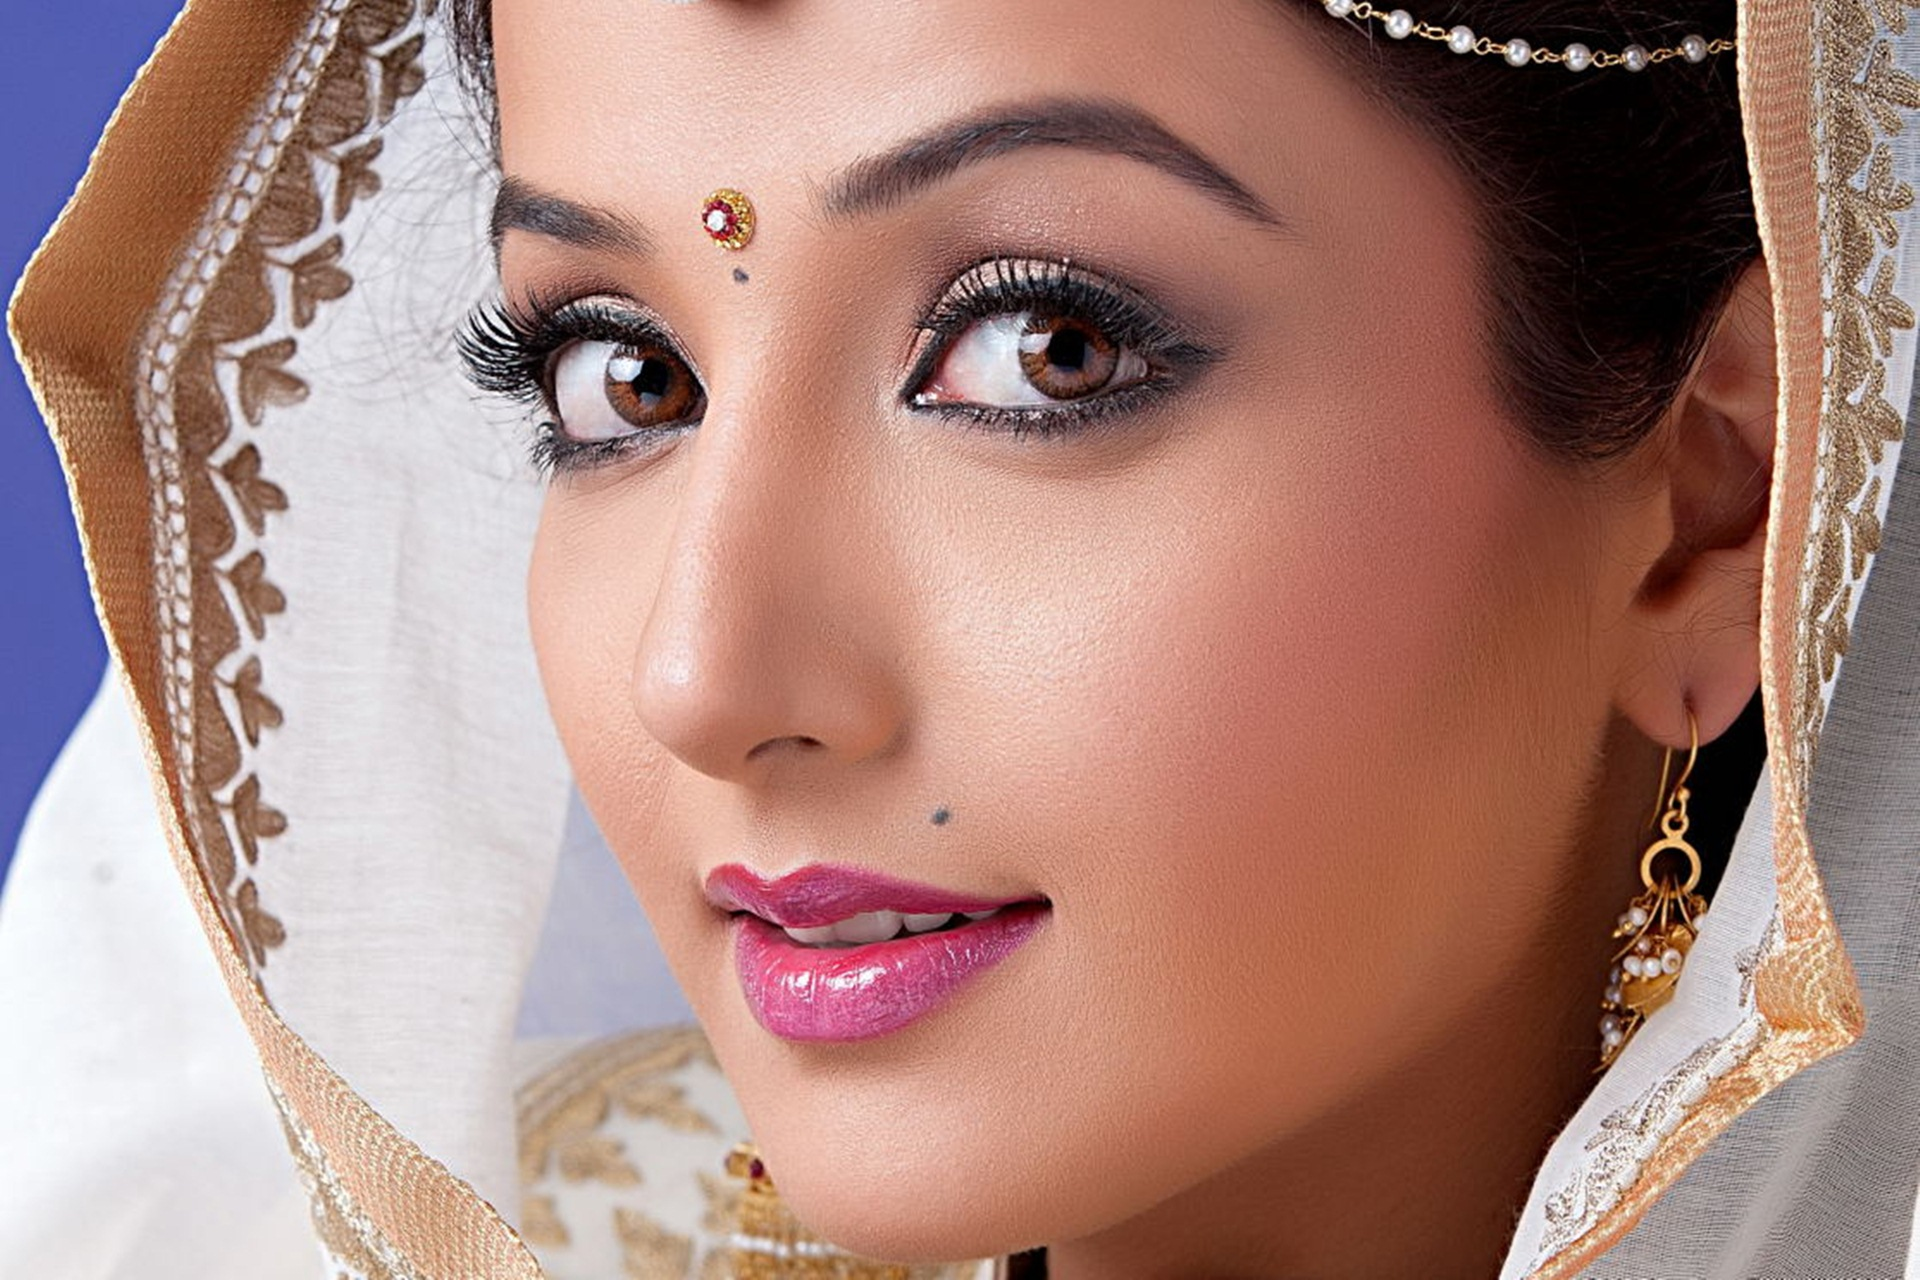 Sonia Mann Punjabi Model Wallpaper 13026